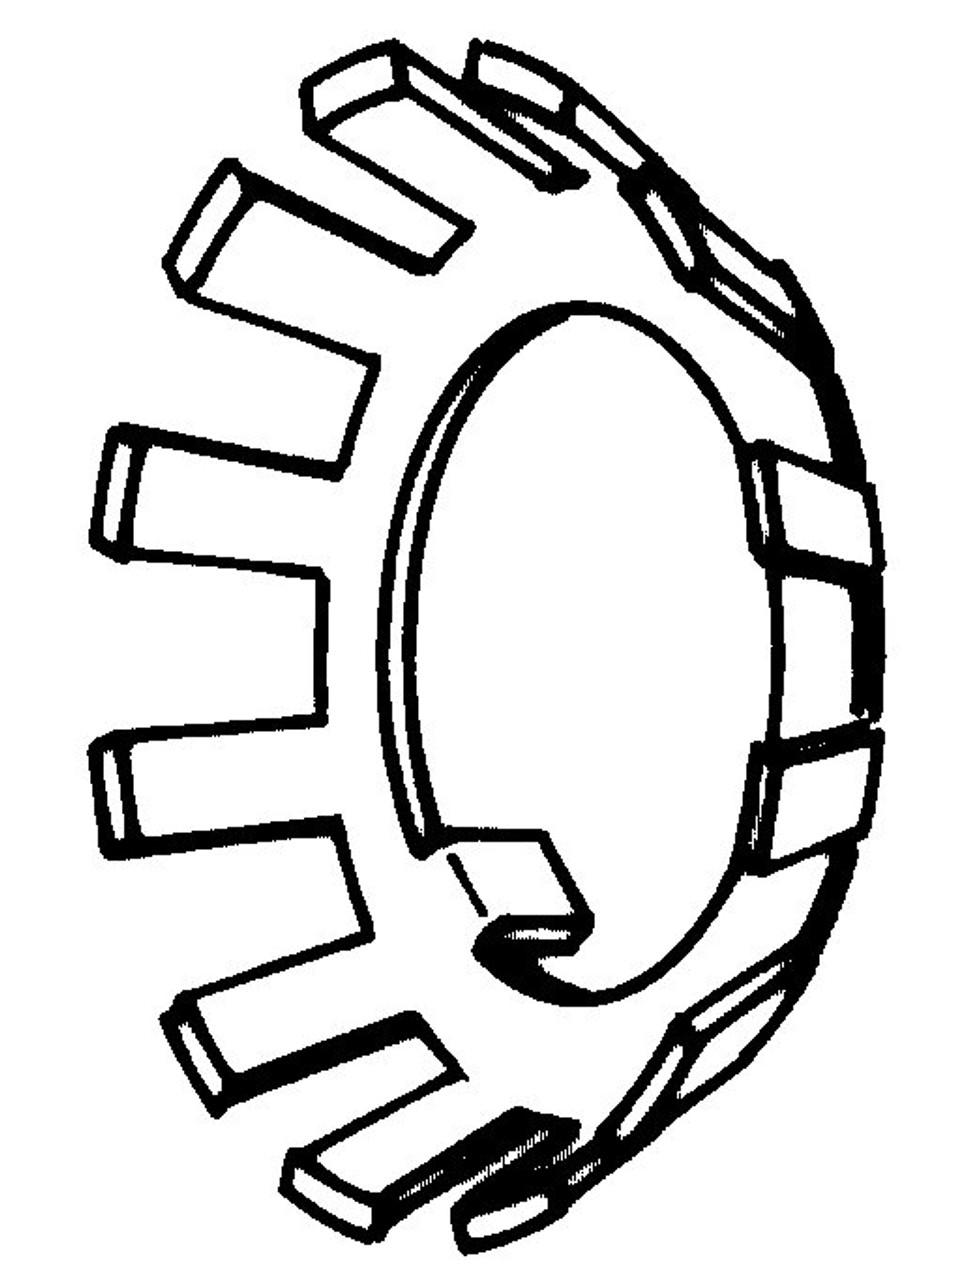 Biro Saws - Upper Shaft Lock Washer